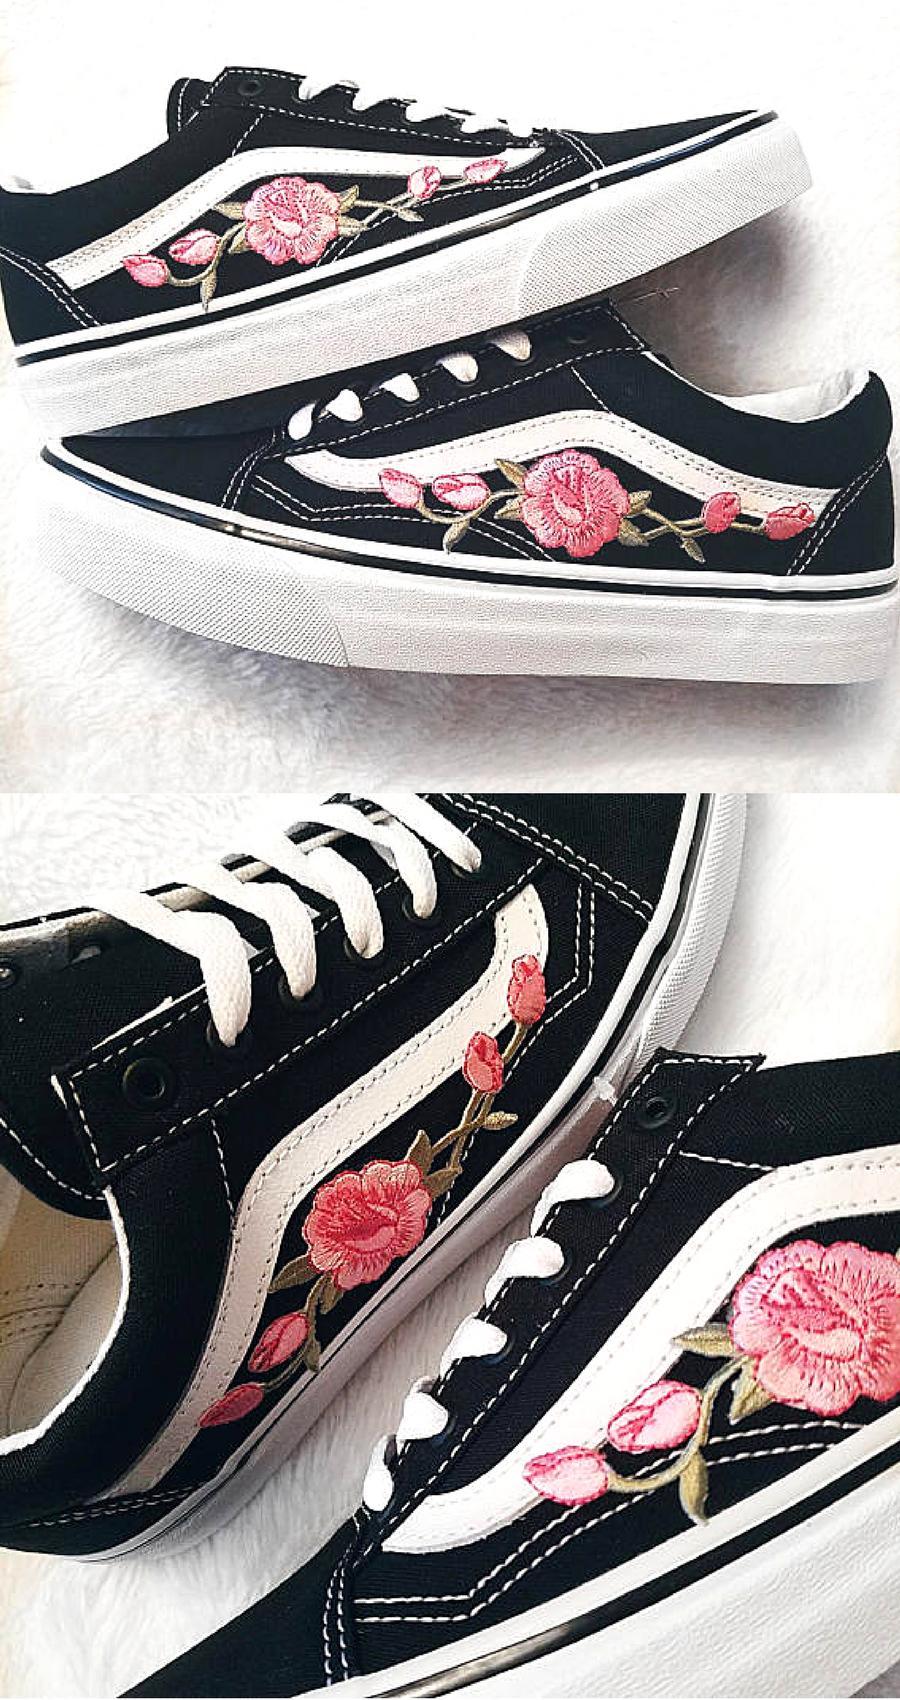 99 Rose Buds Pink Blk Unisex Custom Rose Embroidered Patch Vans Old Skool Sneakers Mens And Wom Sneakers Fashion Outfits Sneaker Outfits Women Vans Old Skool